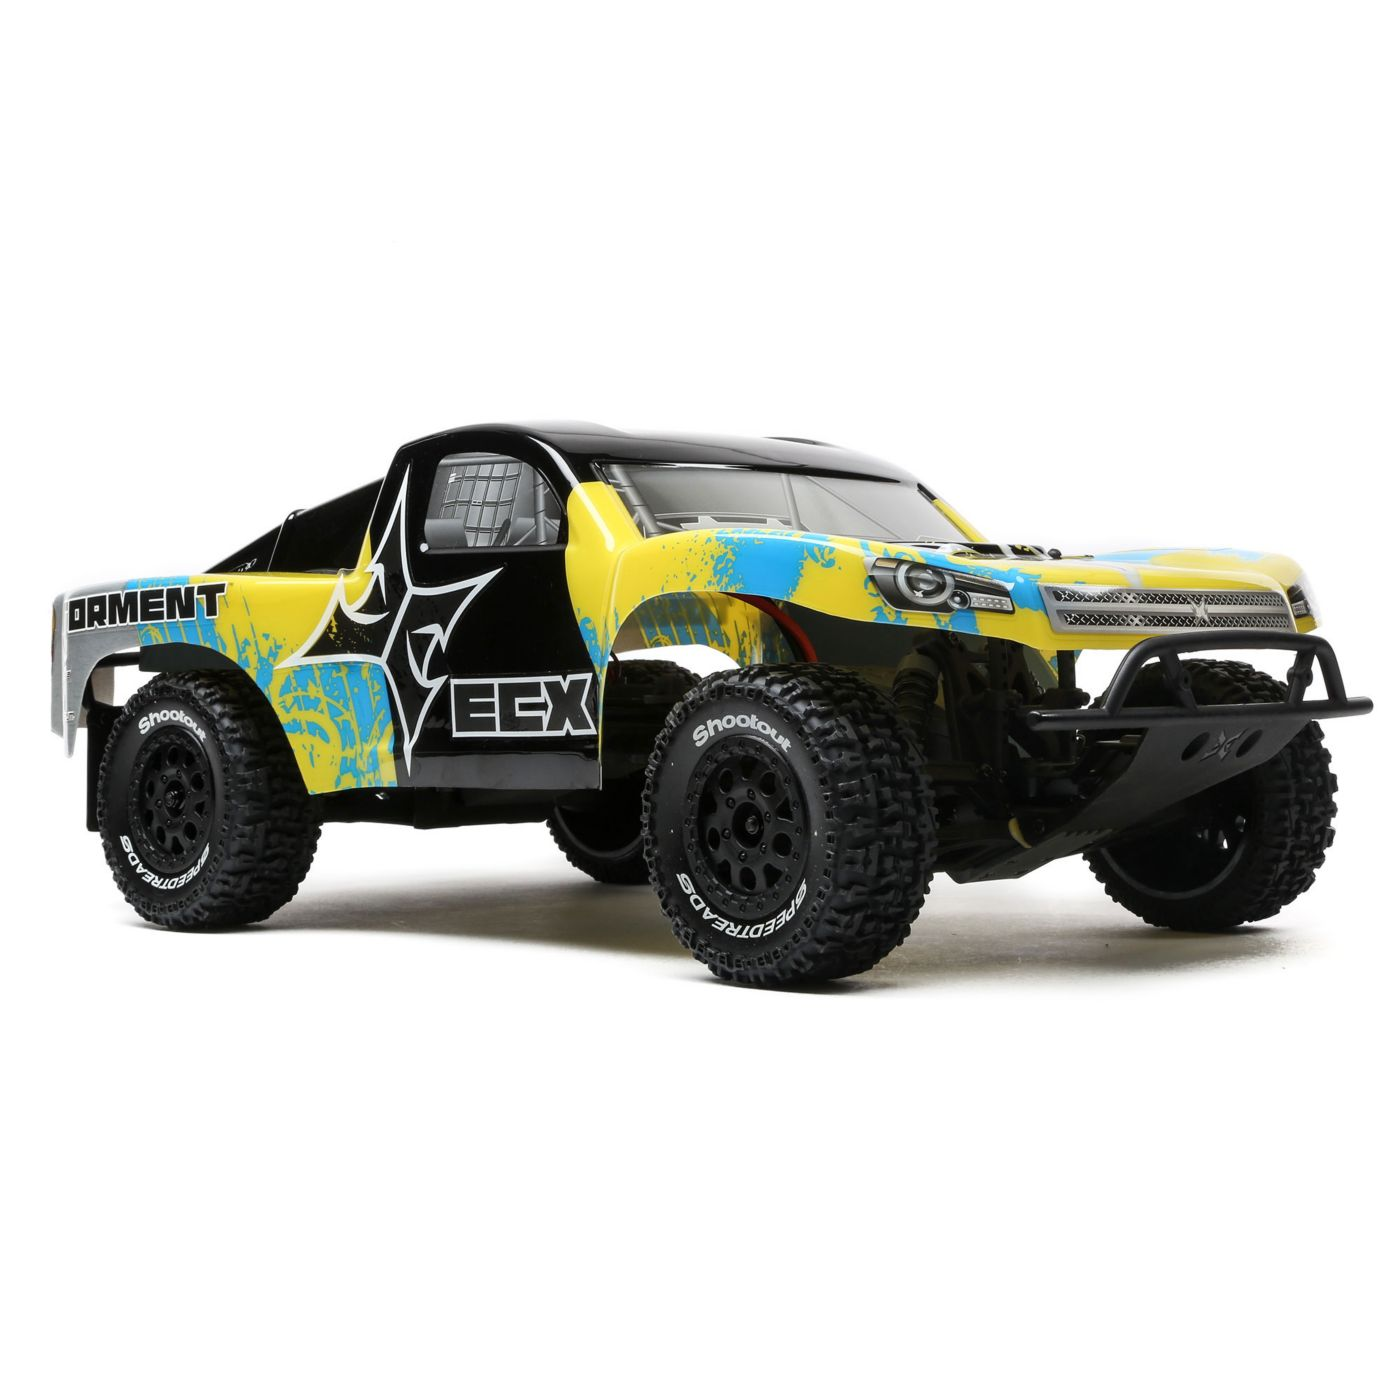 ECX03133T2 ECX 1/10 Torment 2WD LiPo Yellow/Blue